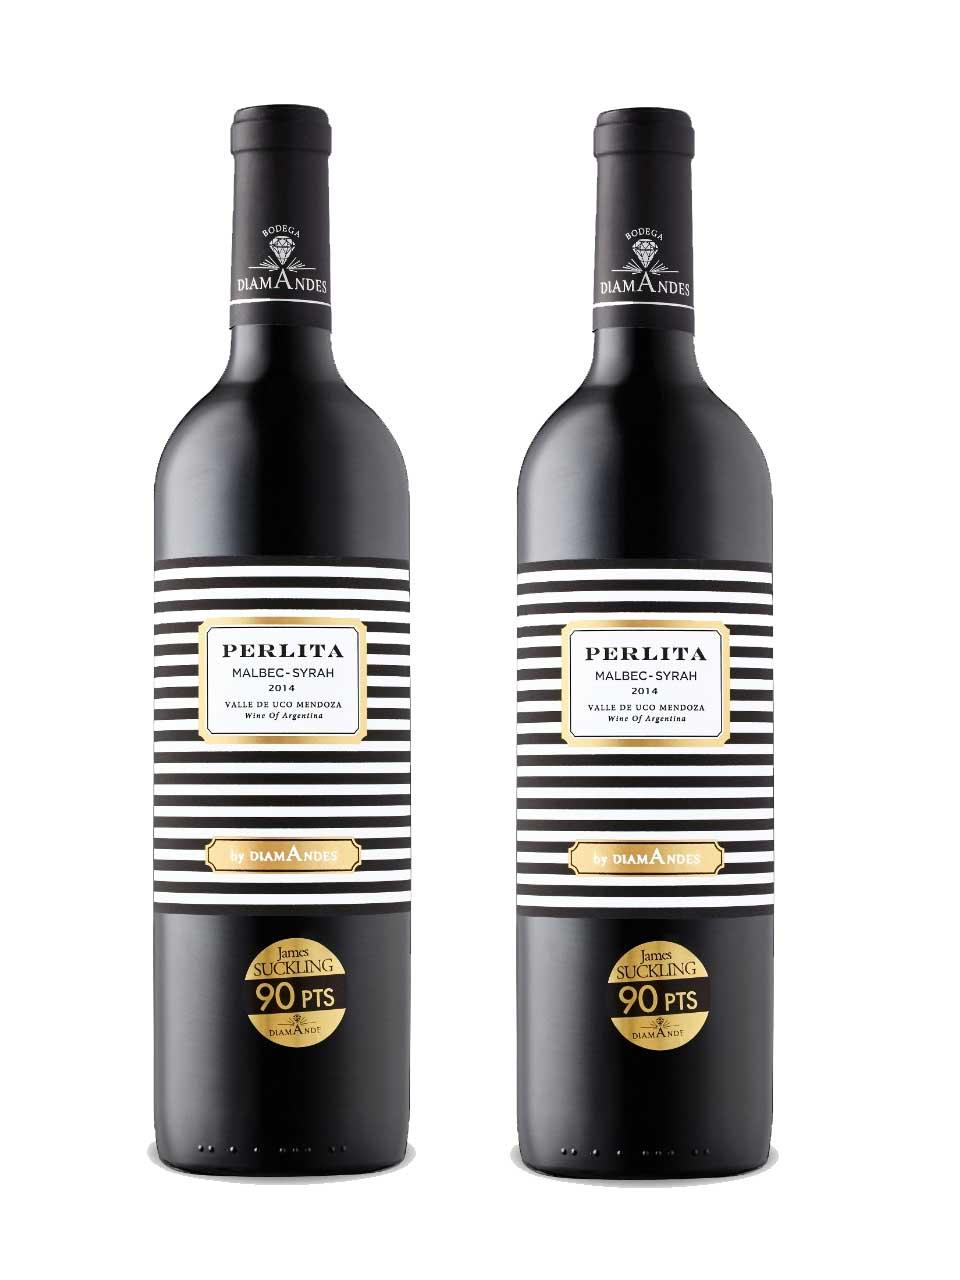 Rượu vang Argentina DiamAndes Perlita Malbec-Syrah